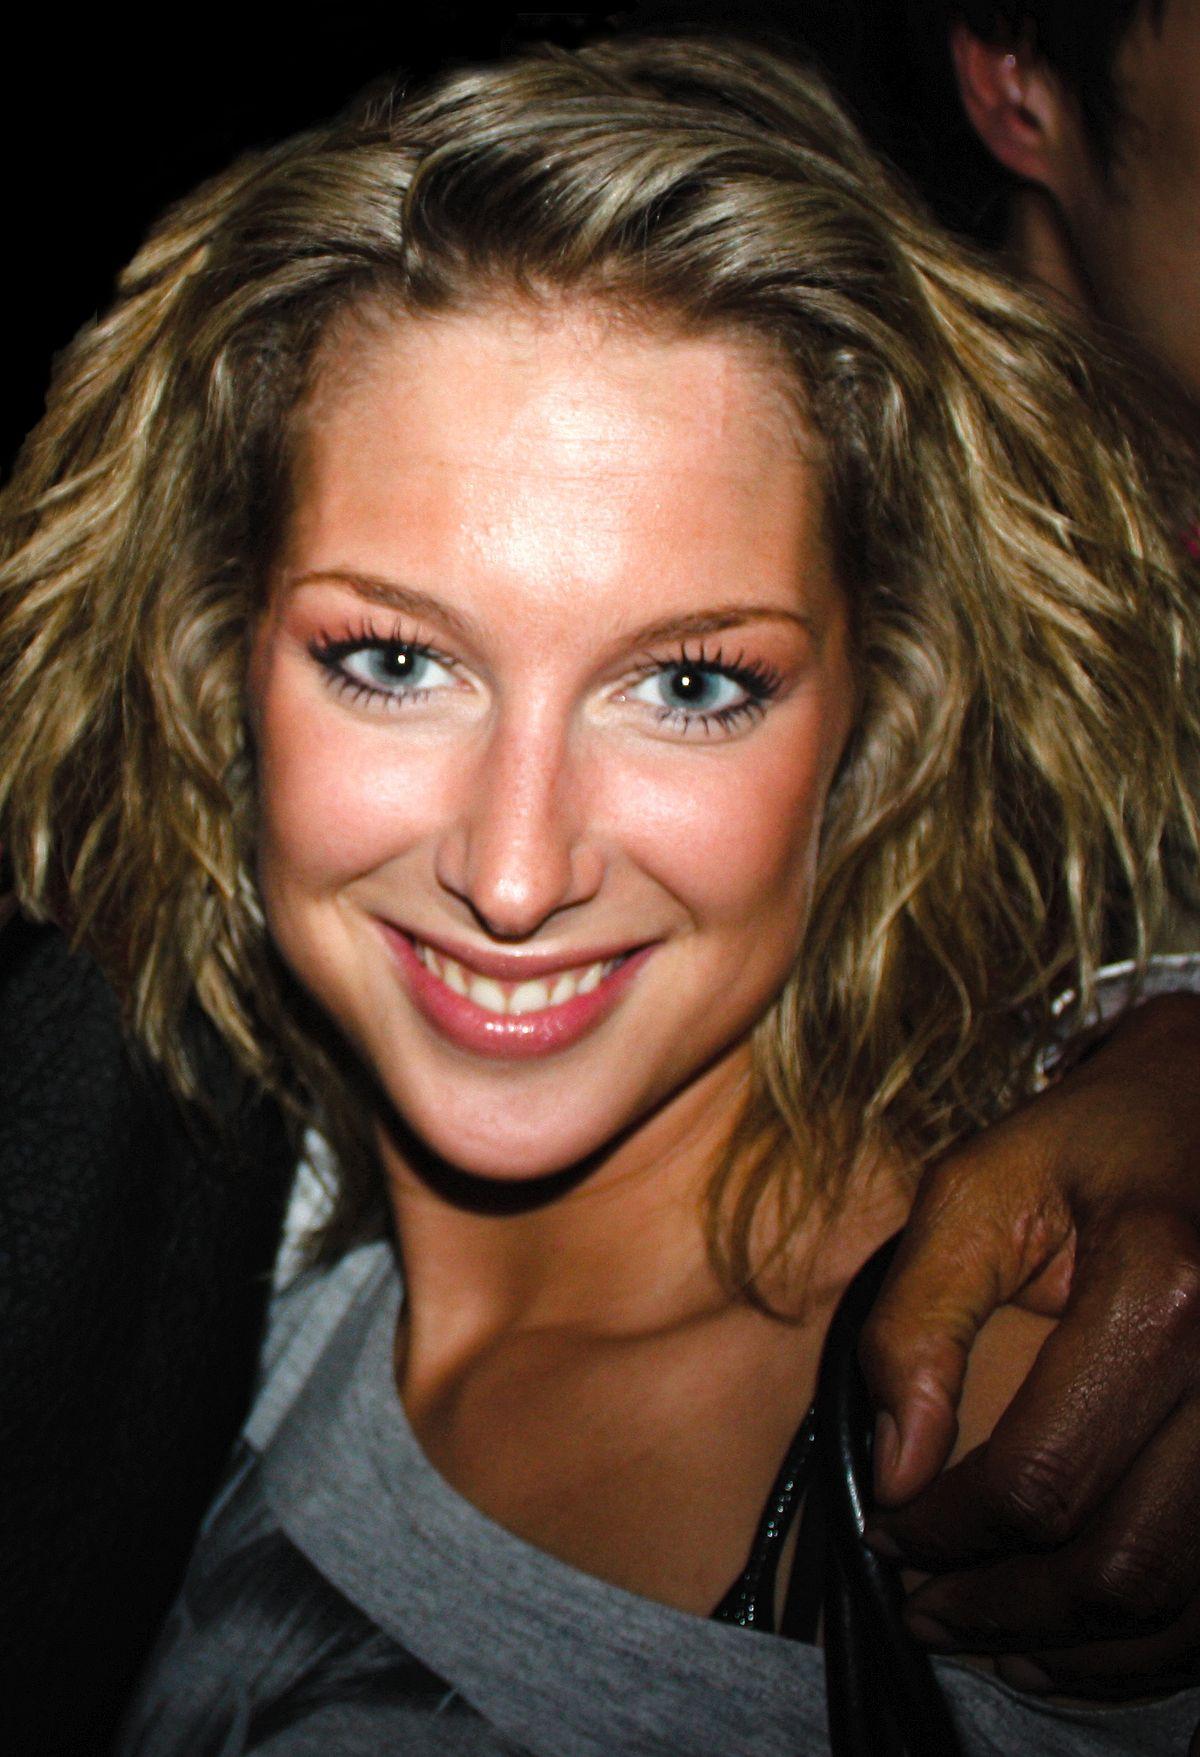 Samantha Rowley (born 1988)